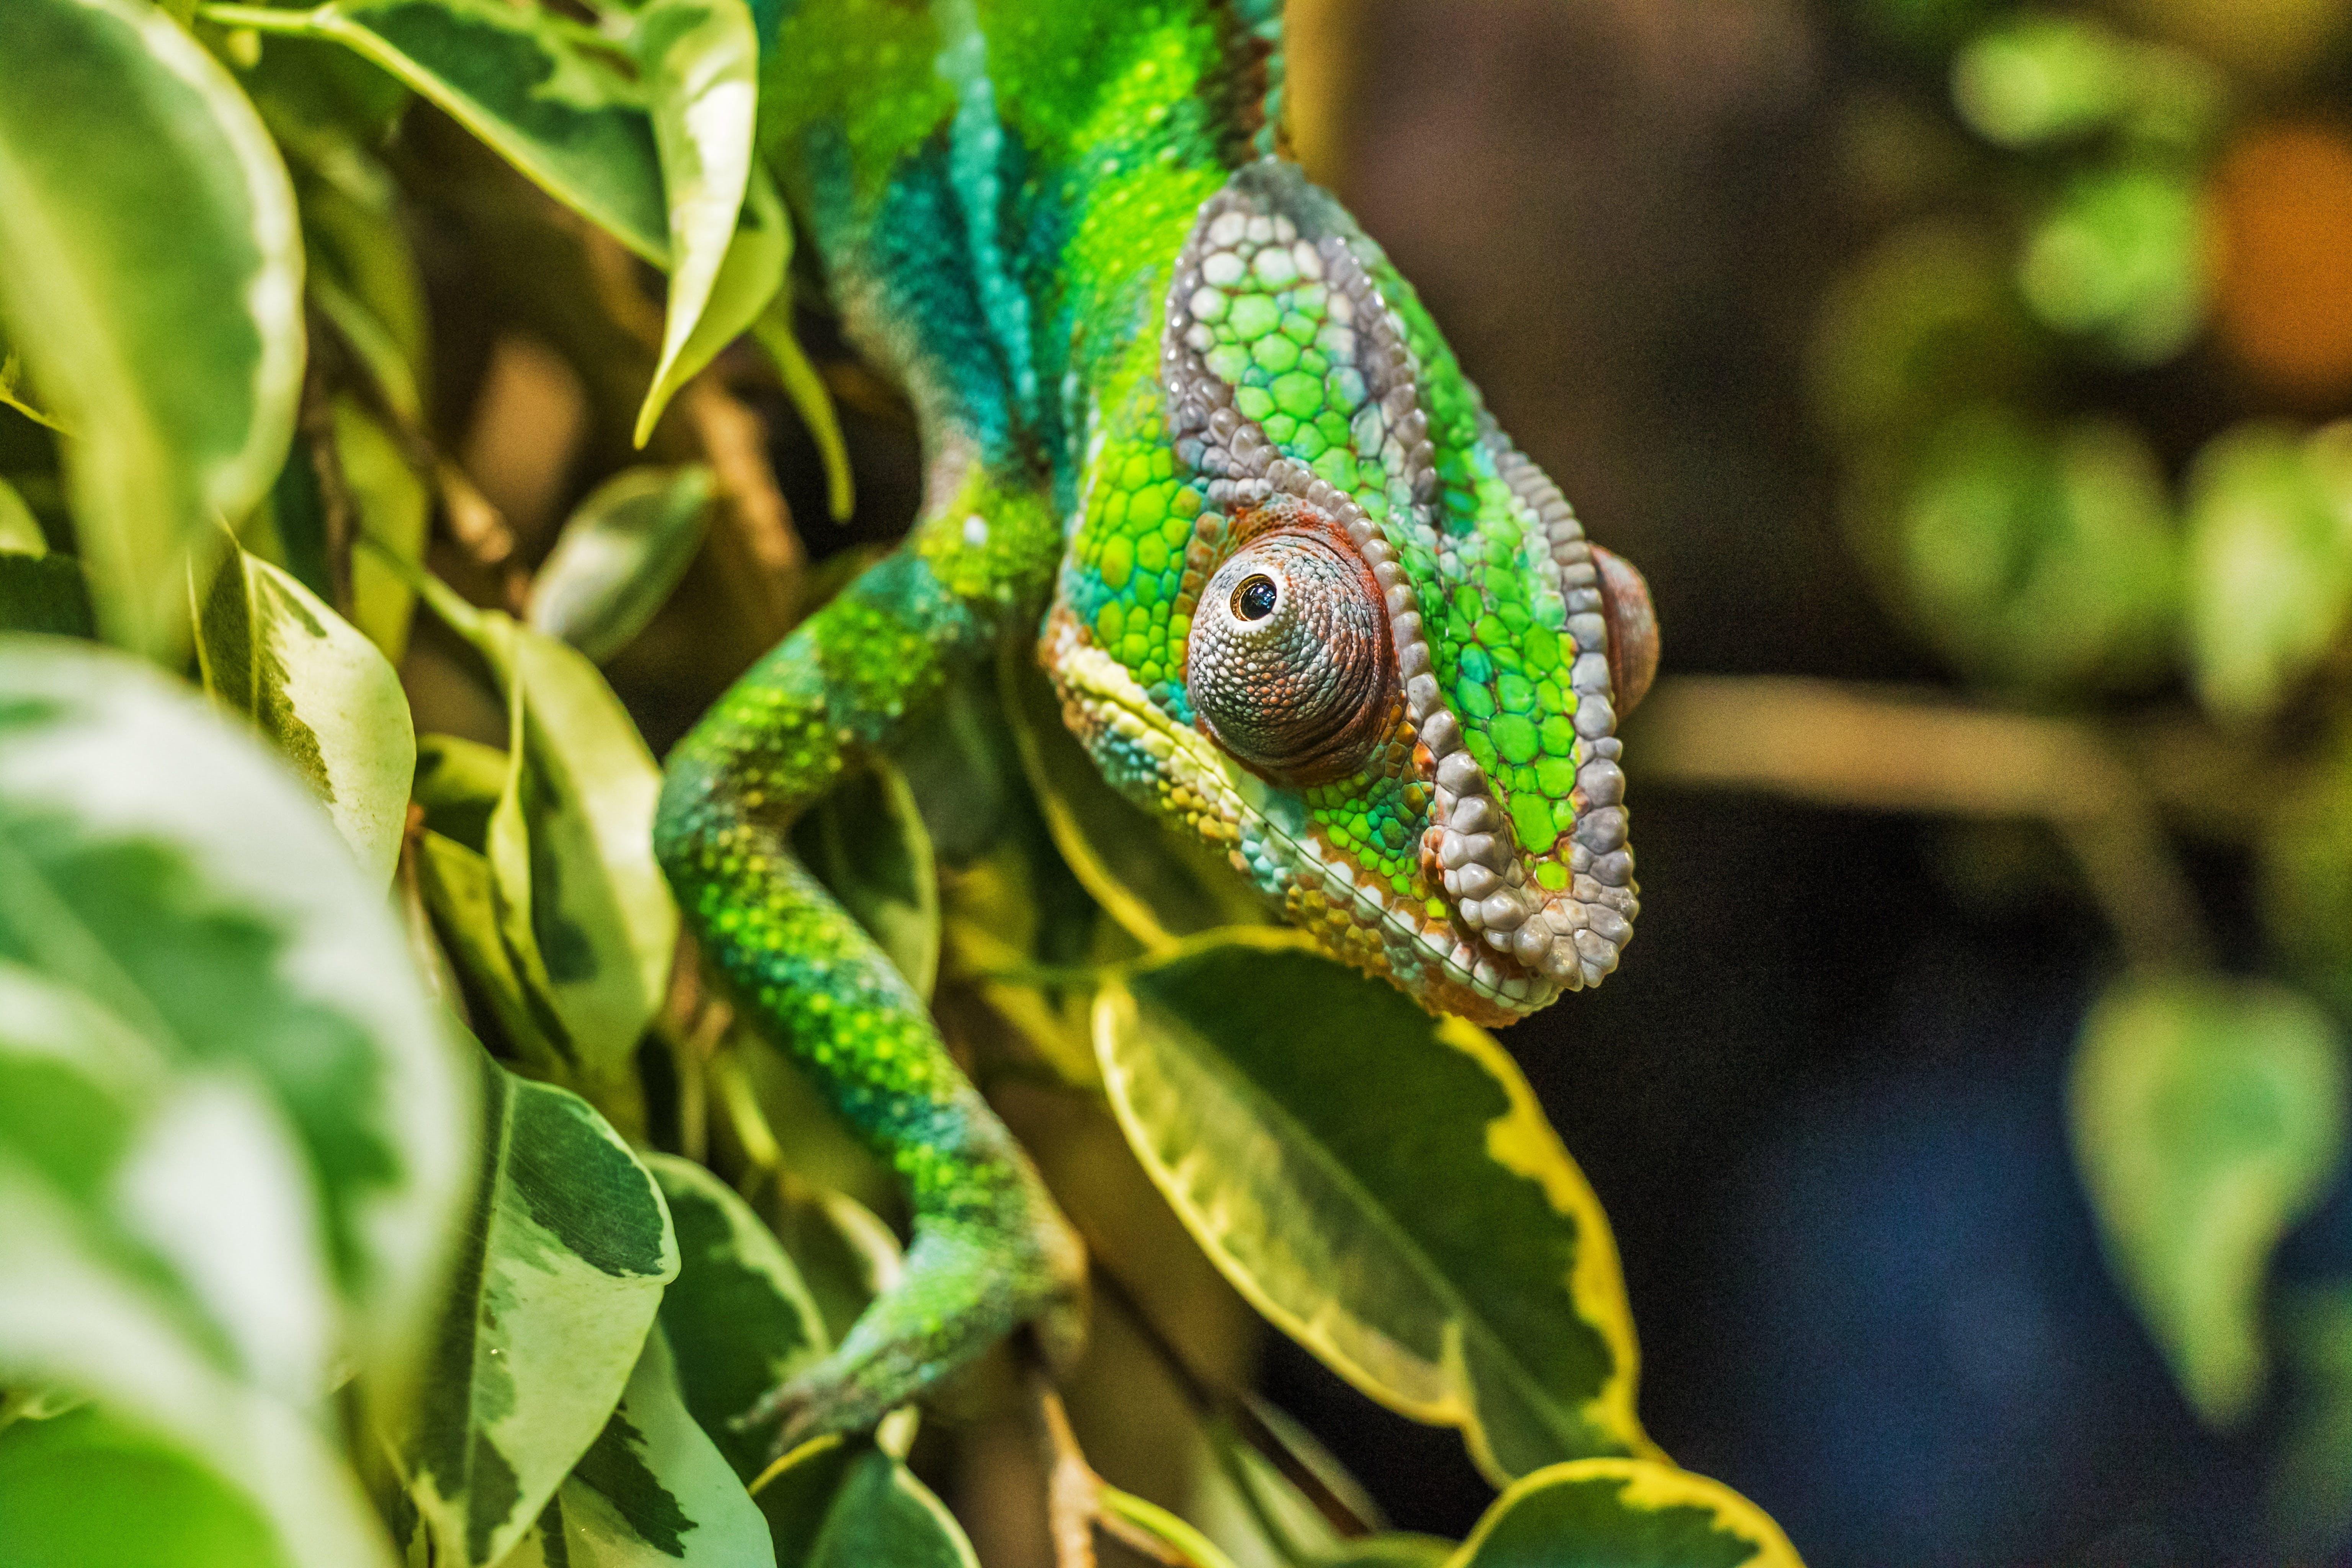 Gratis arkivbilde med chamaeleon, dyr, dyrefotografering, dyreliv